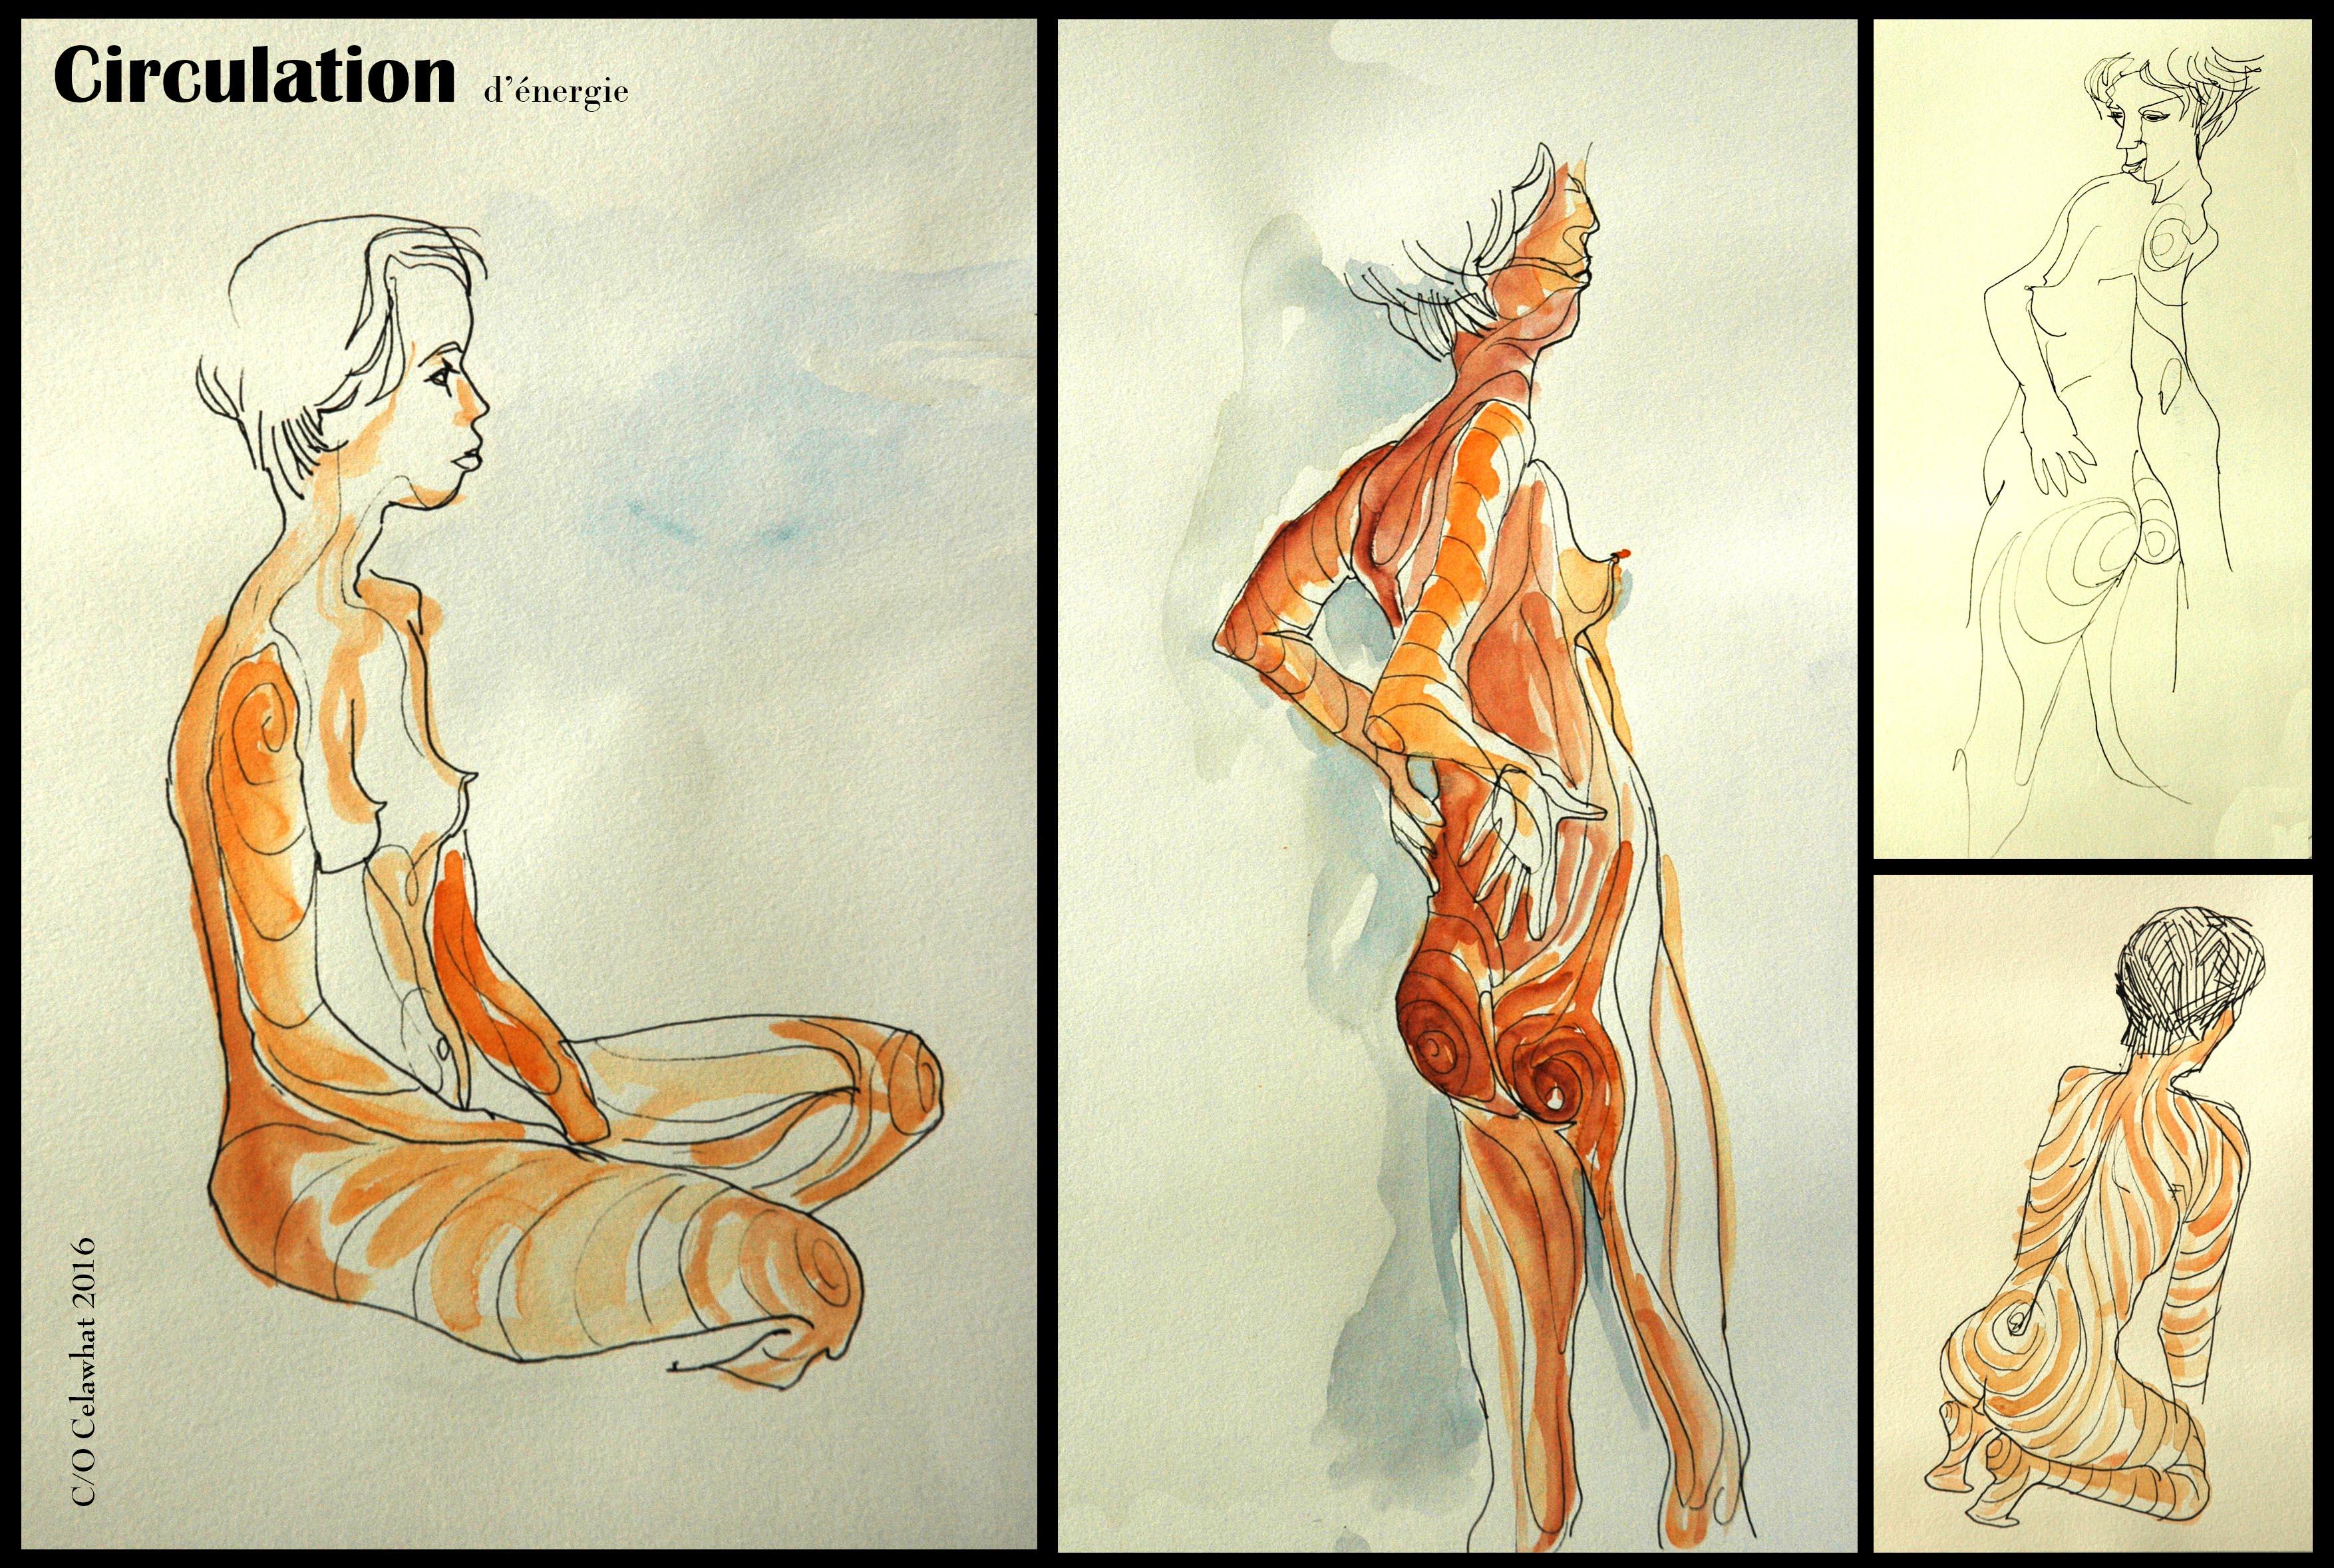 circulation-denergie-09